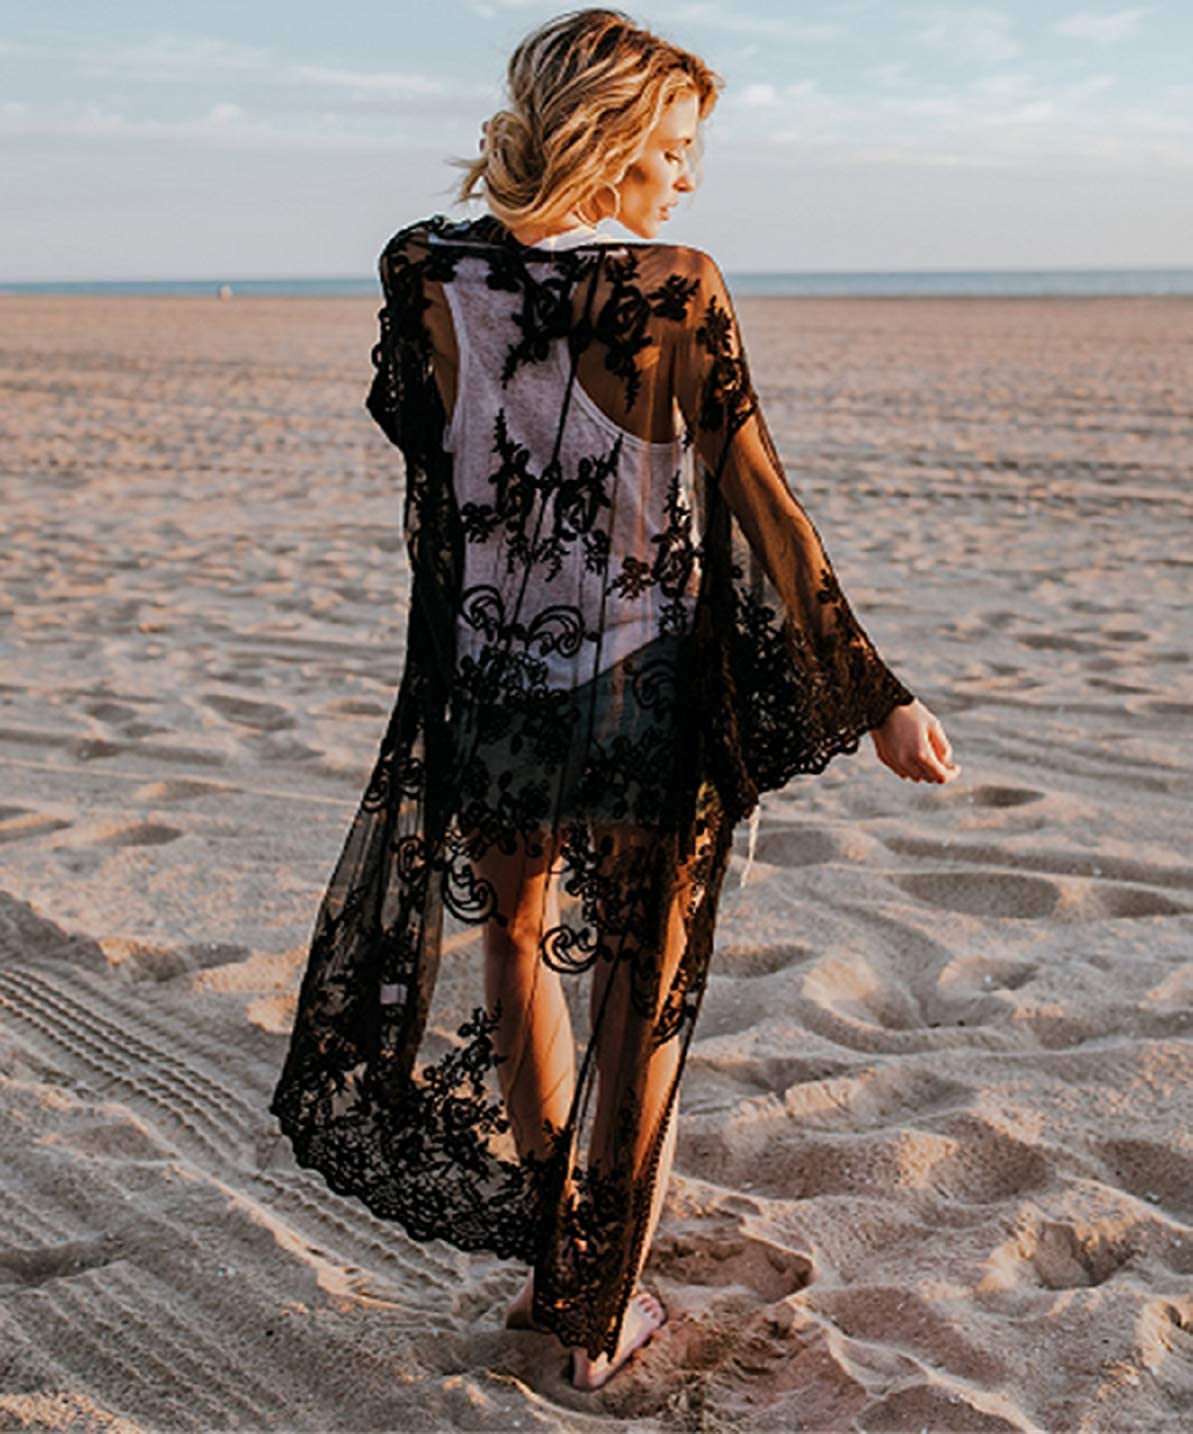 Women's Bathing Suit Kimono Beach Cover Up Lace Crochet Pool Swimwear (Black) at  Women's Clothing store